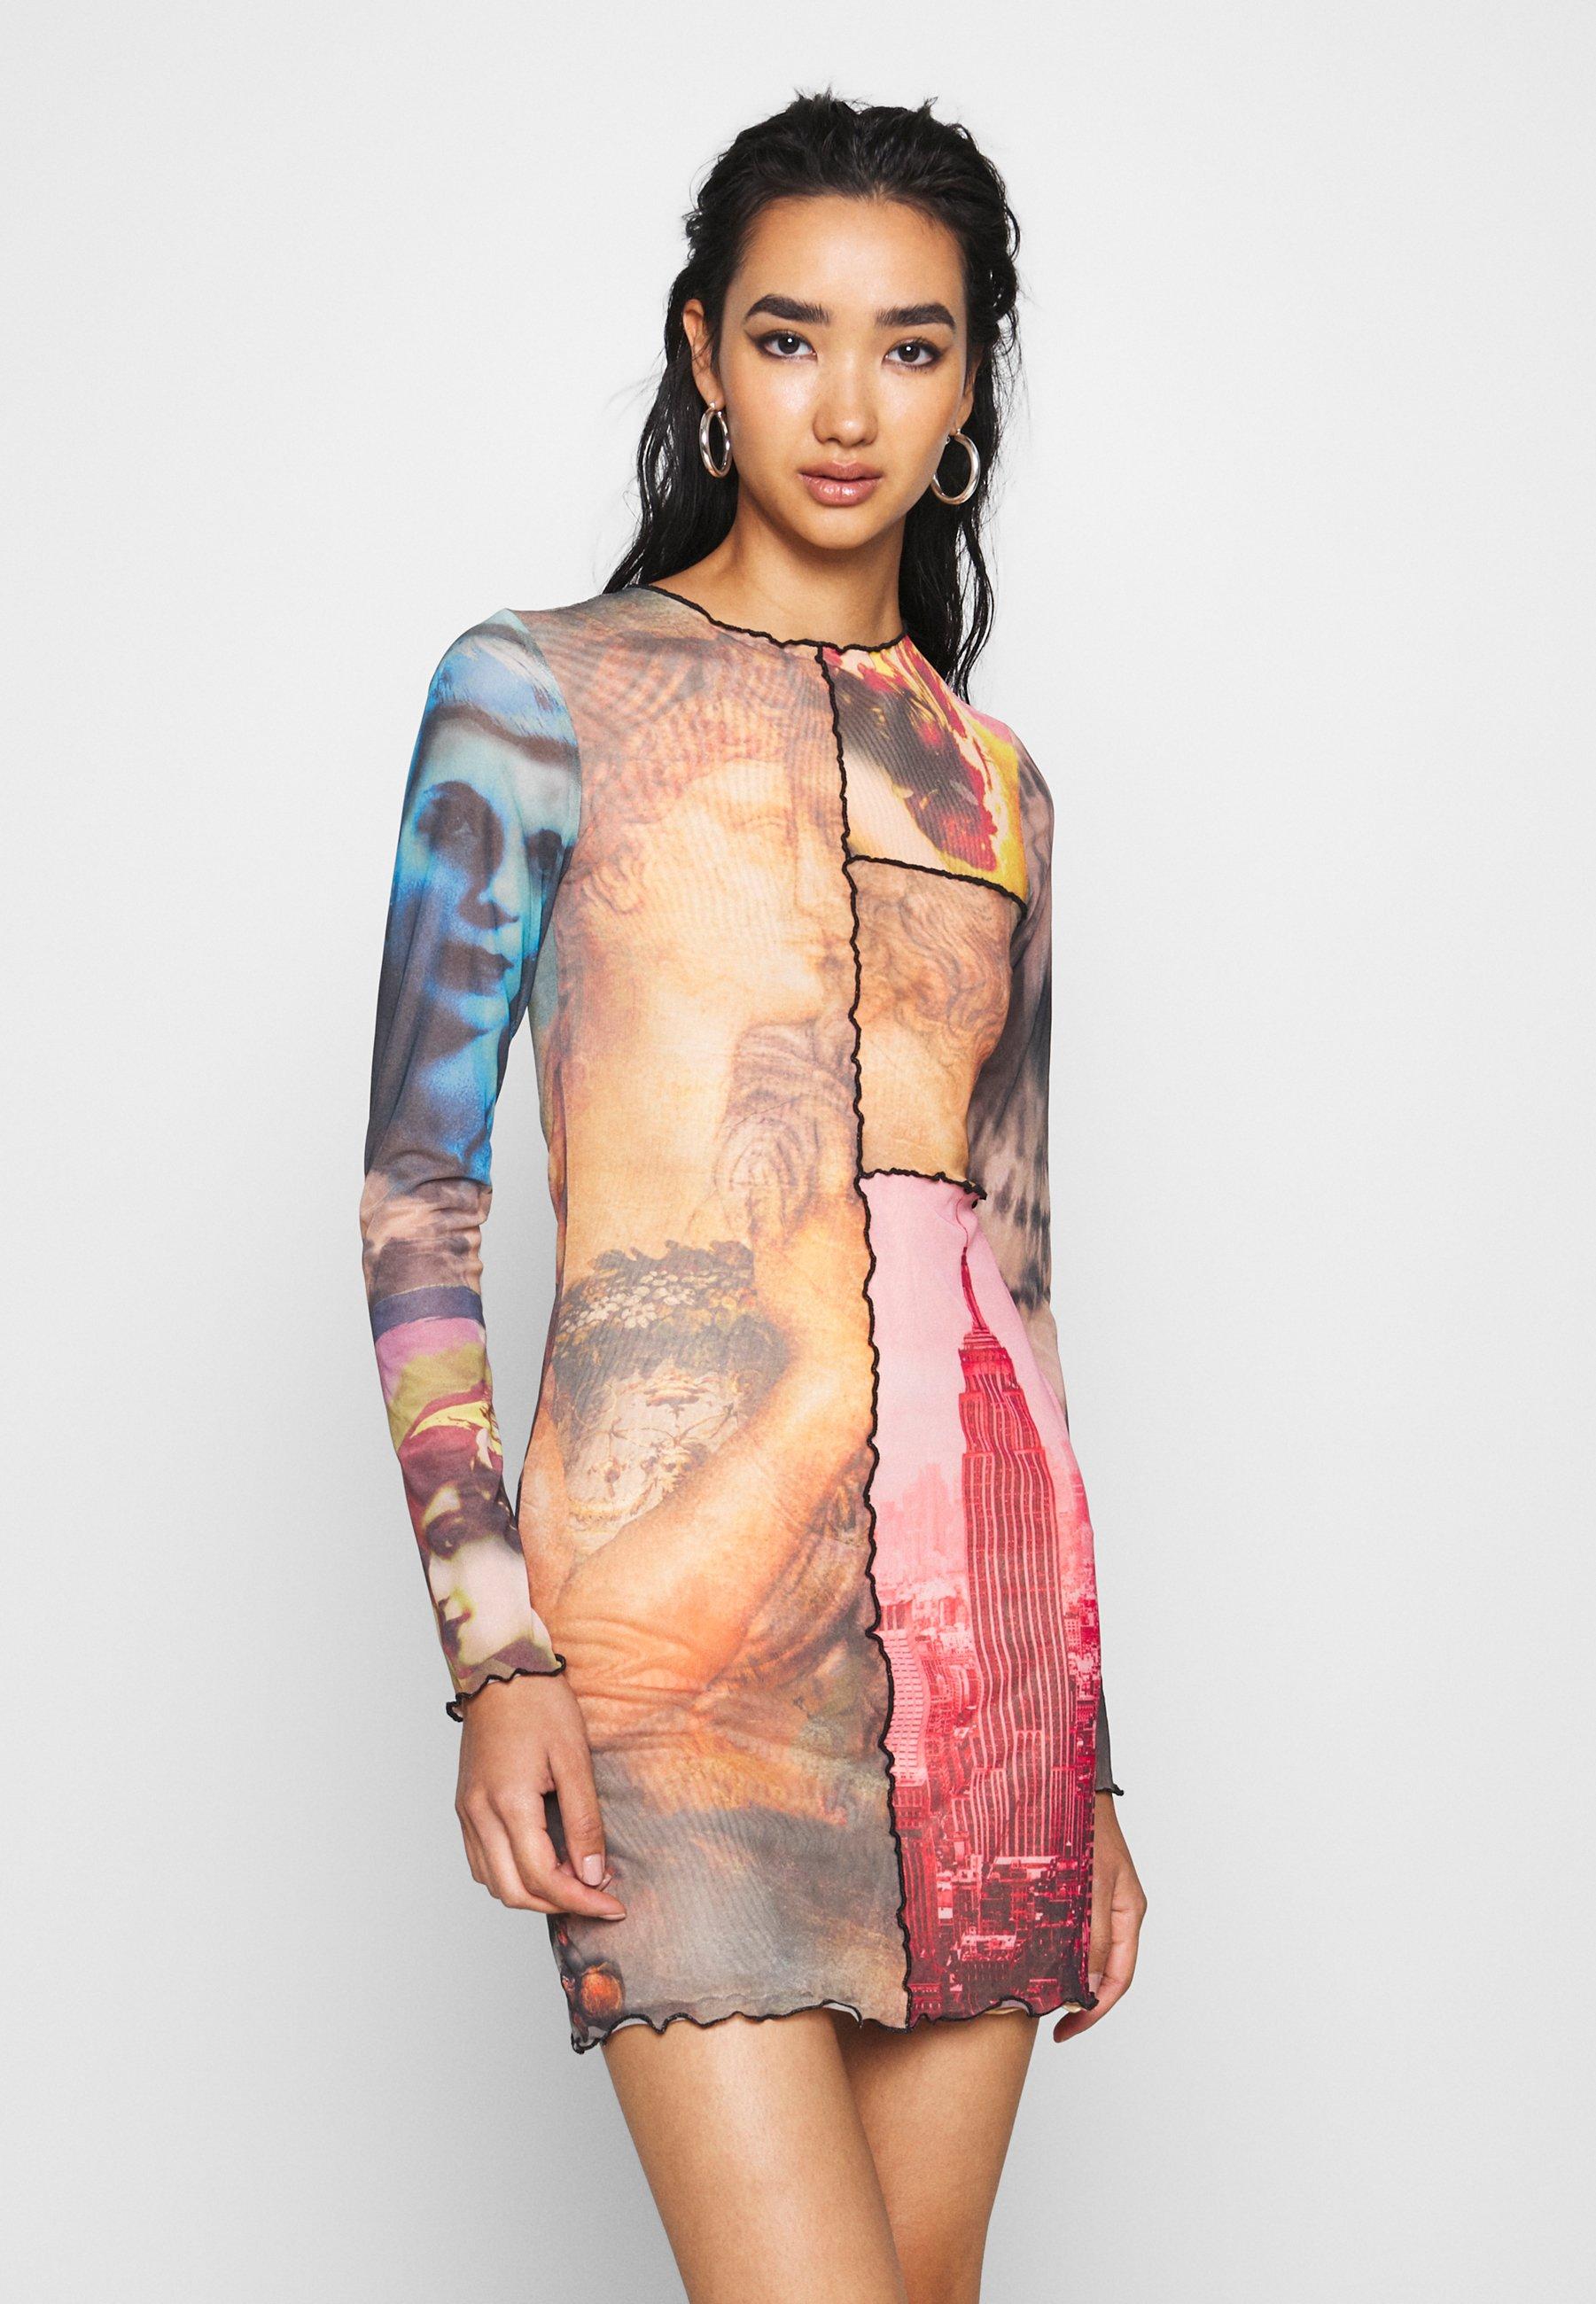 PANELLED DRESS WITH BABYLOCK SEAMS MASH UP VINTAGE PRINTS - Day dress